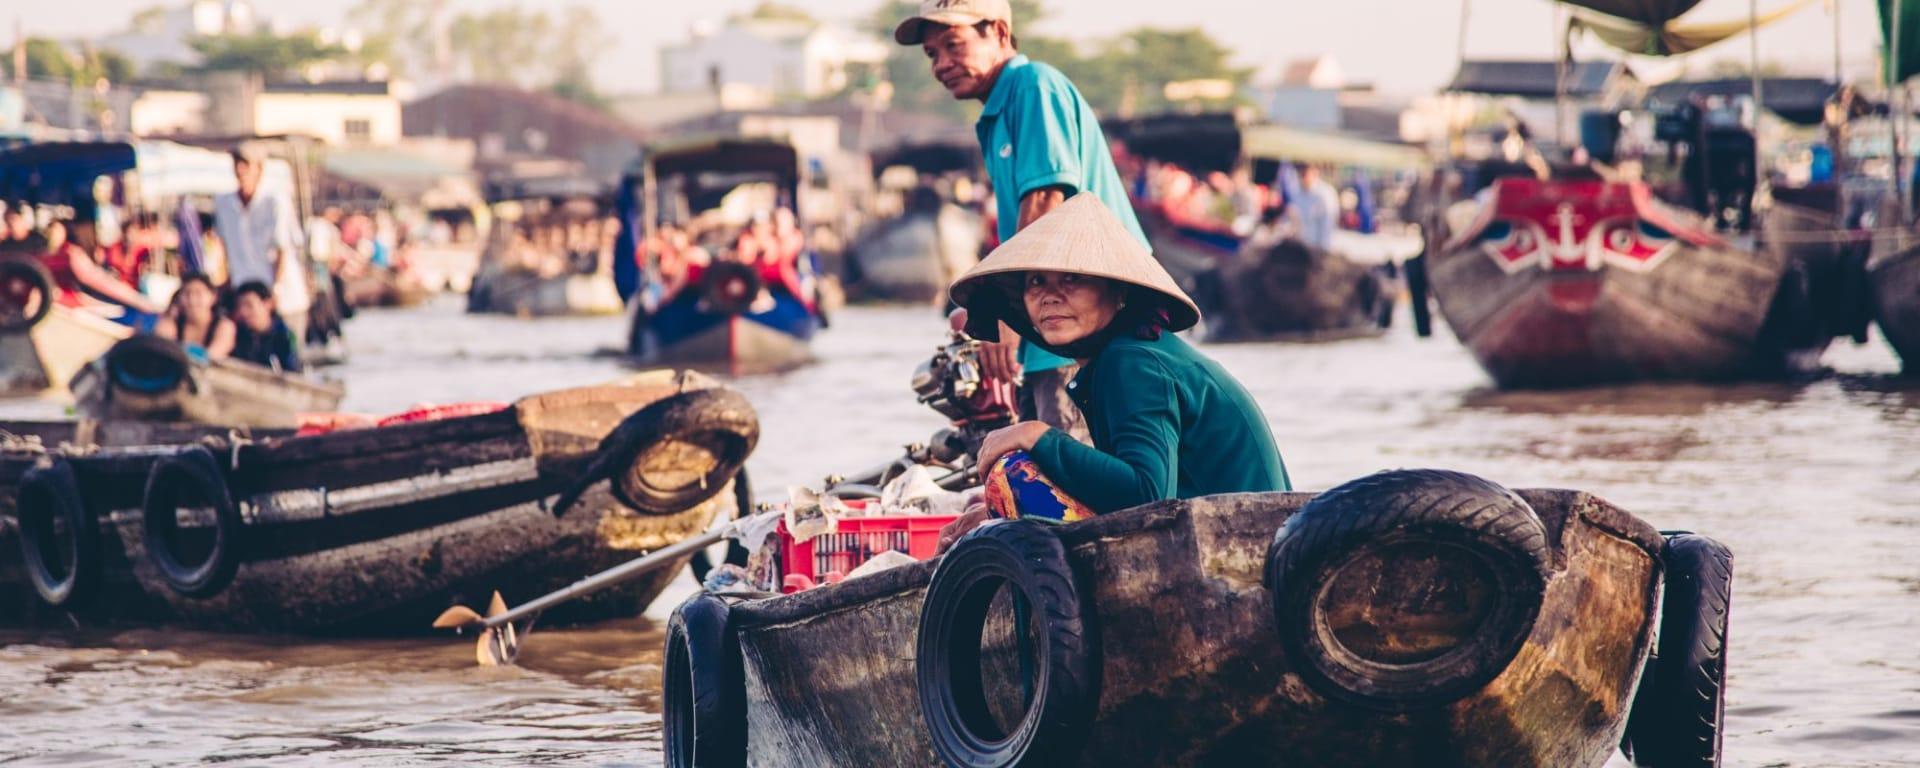 Le delta du Mékong - de/à Saigon: Mekong Delta Floating Market